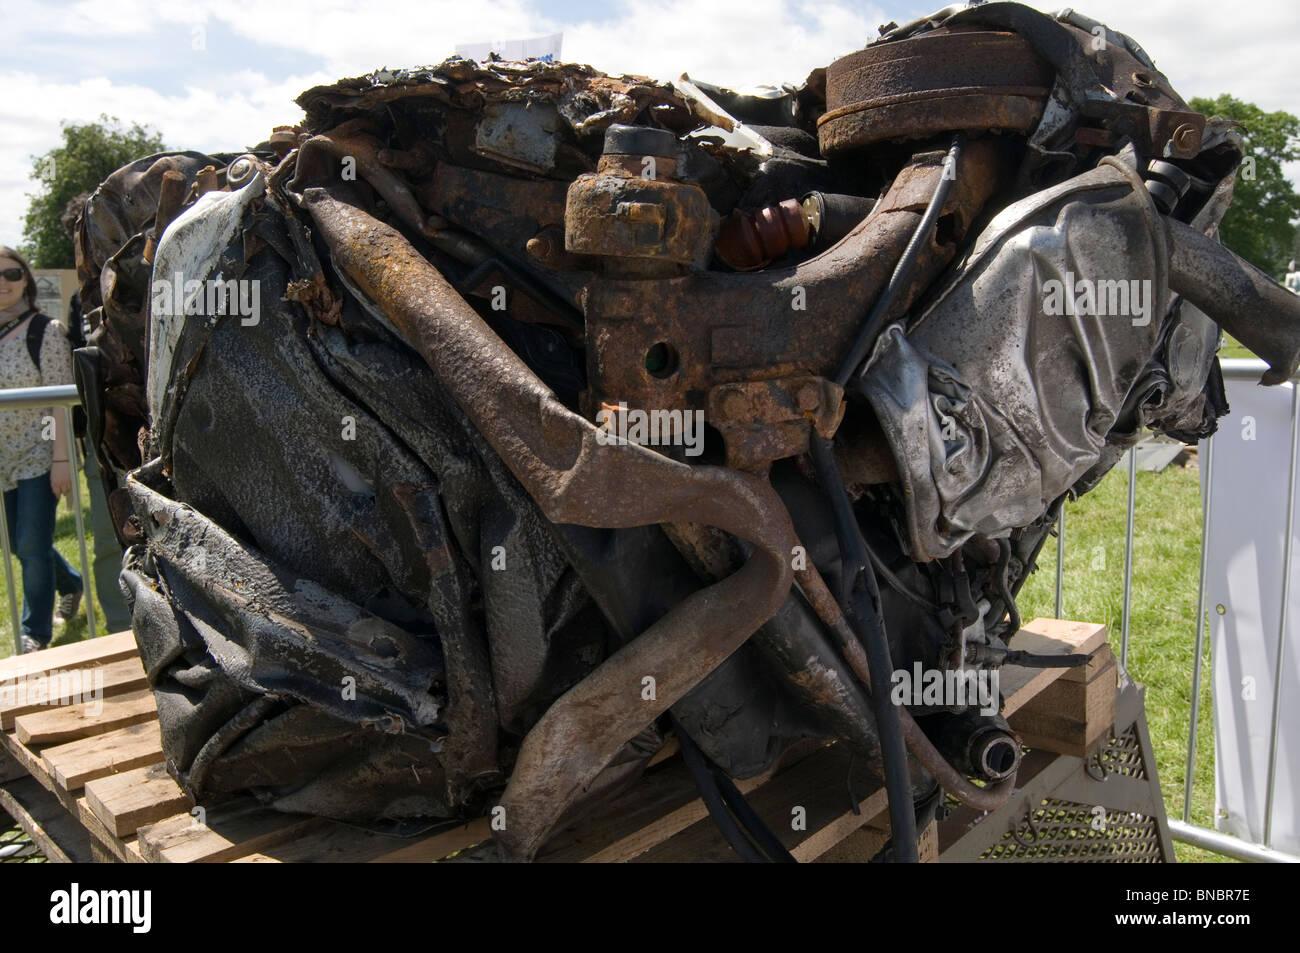 crushed car crusher crush scrap junk recycling squashed cars old ...